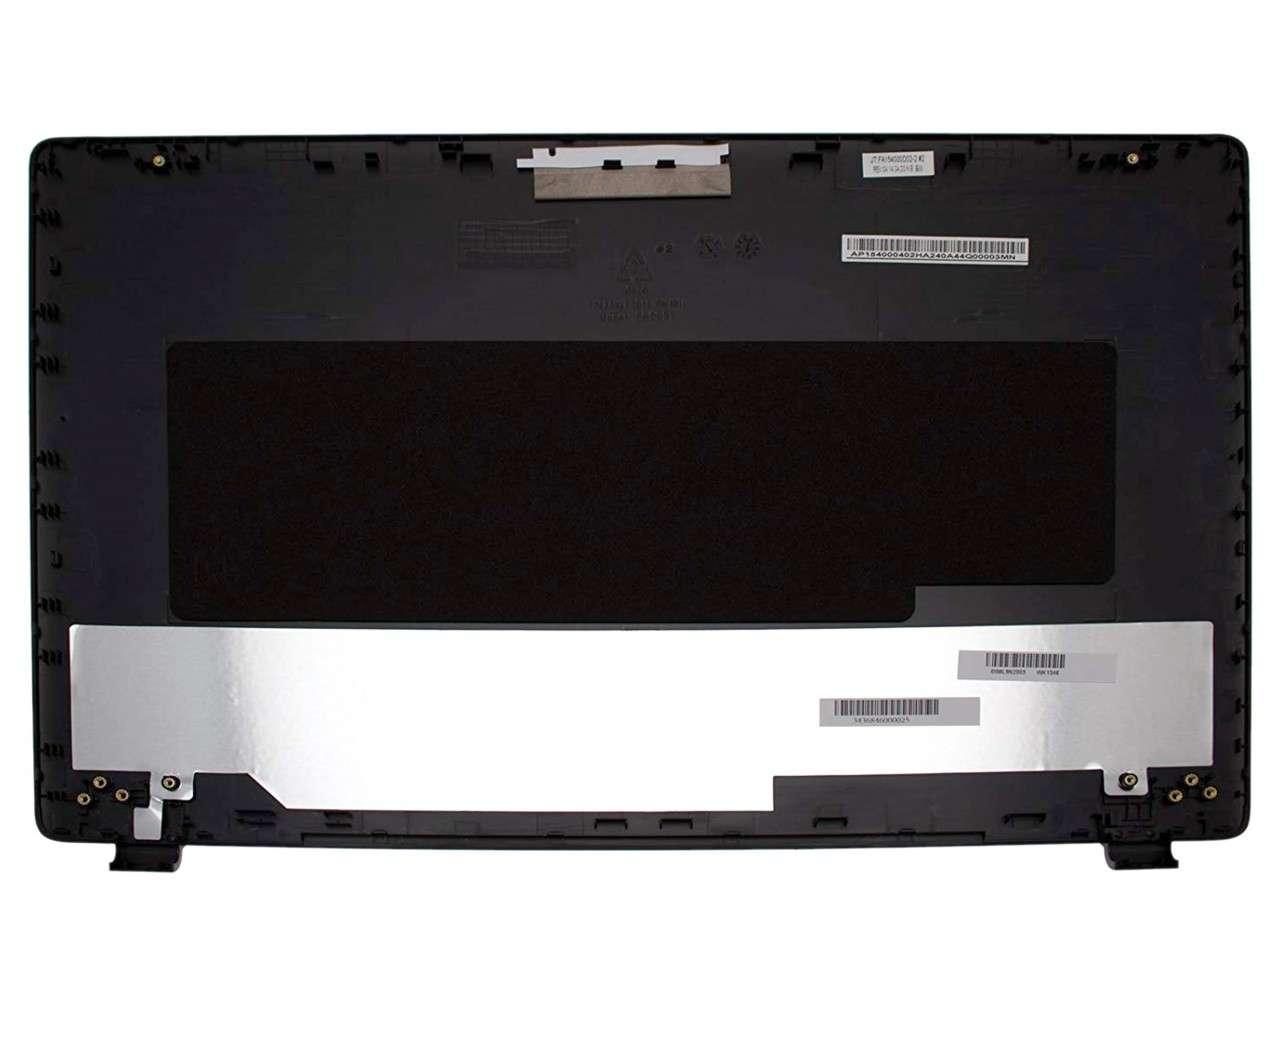 Capac Display BackCover Acer Aspire E5 531 Carcasa Display Neagra imagine